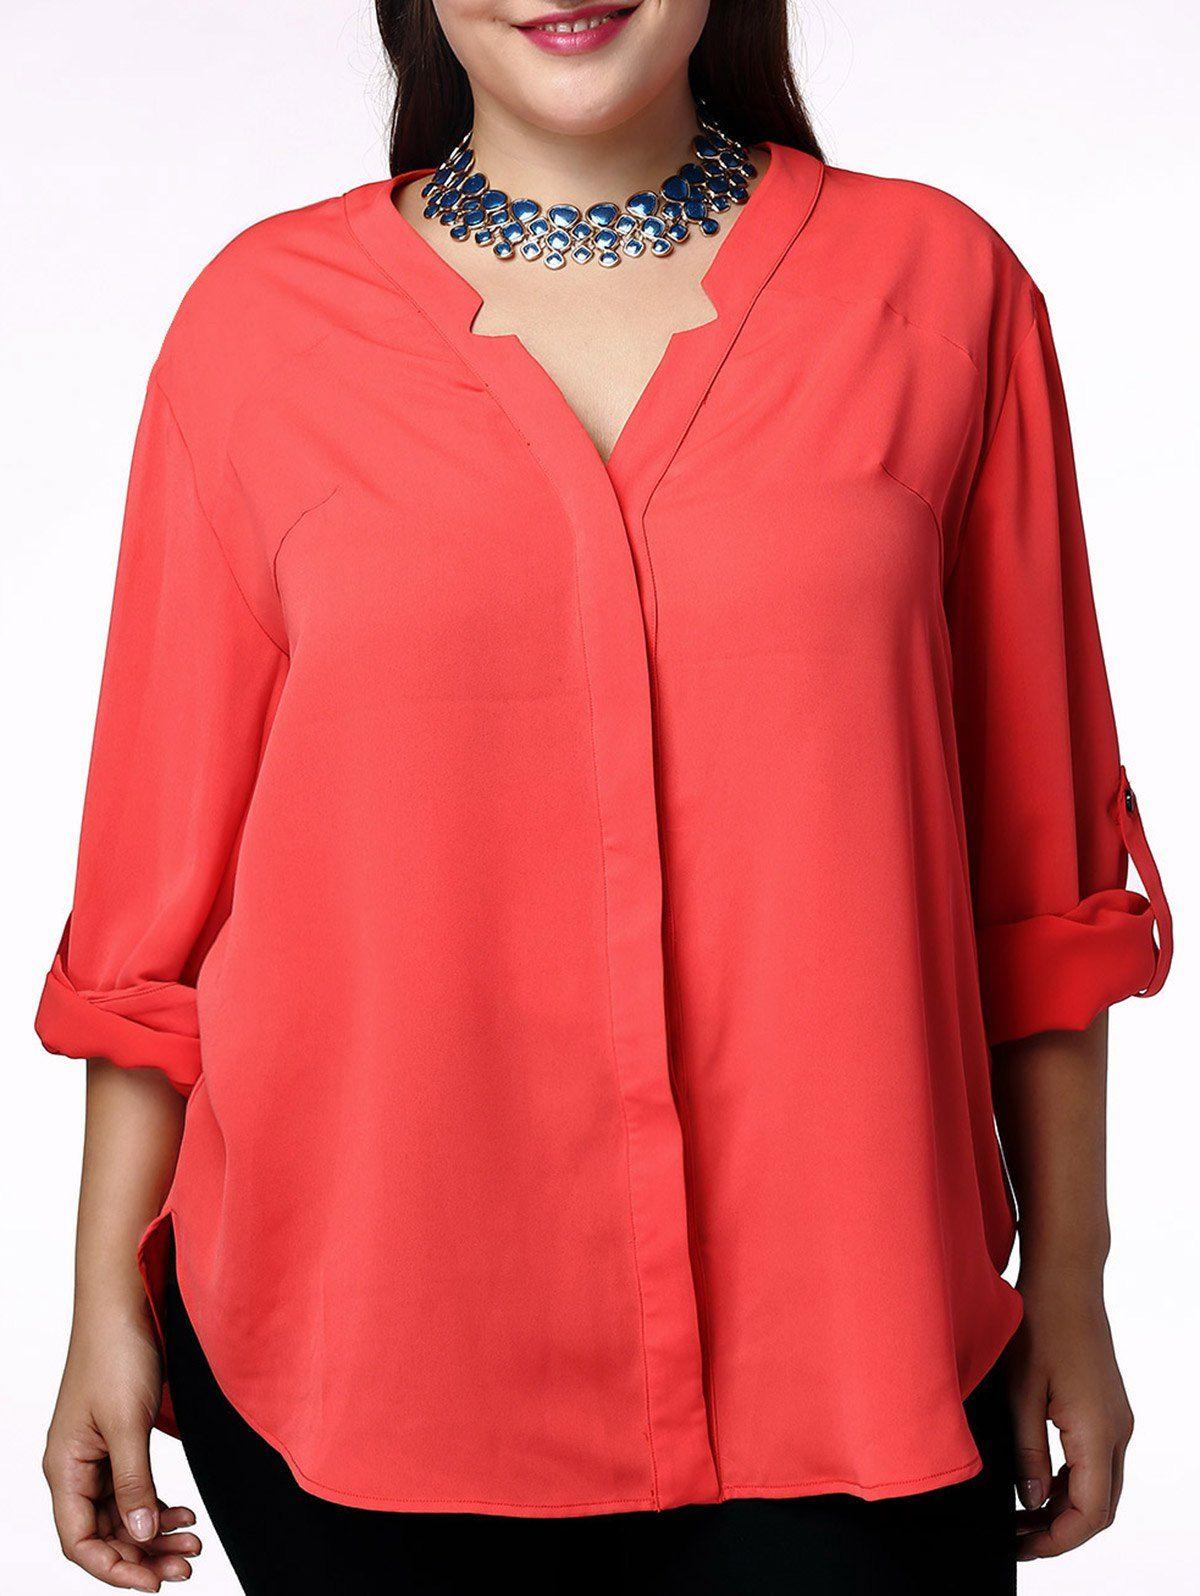 430abb83a0d Elegant V-Neck Solid Color 3 4 Sleeve Plus Size Blouse For Women ...